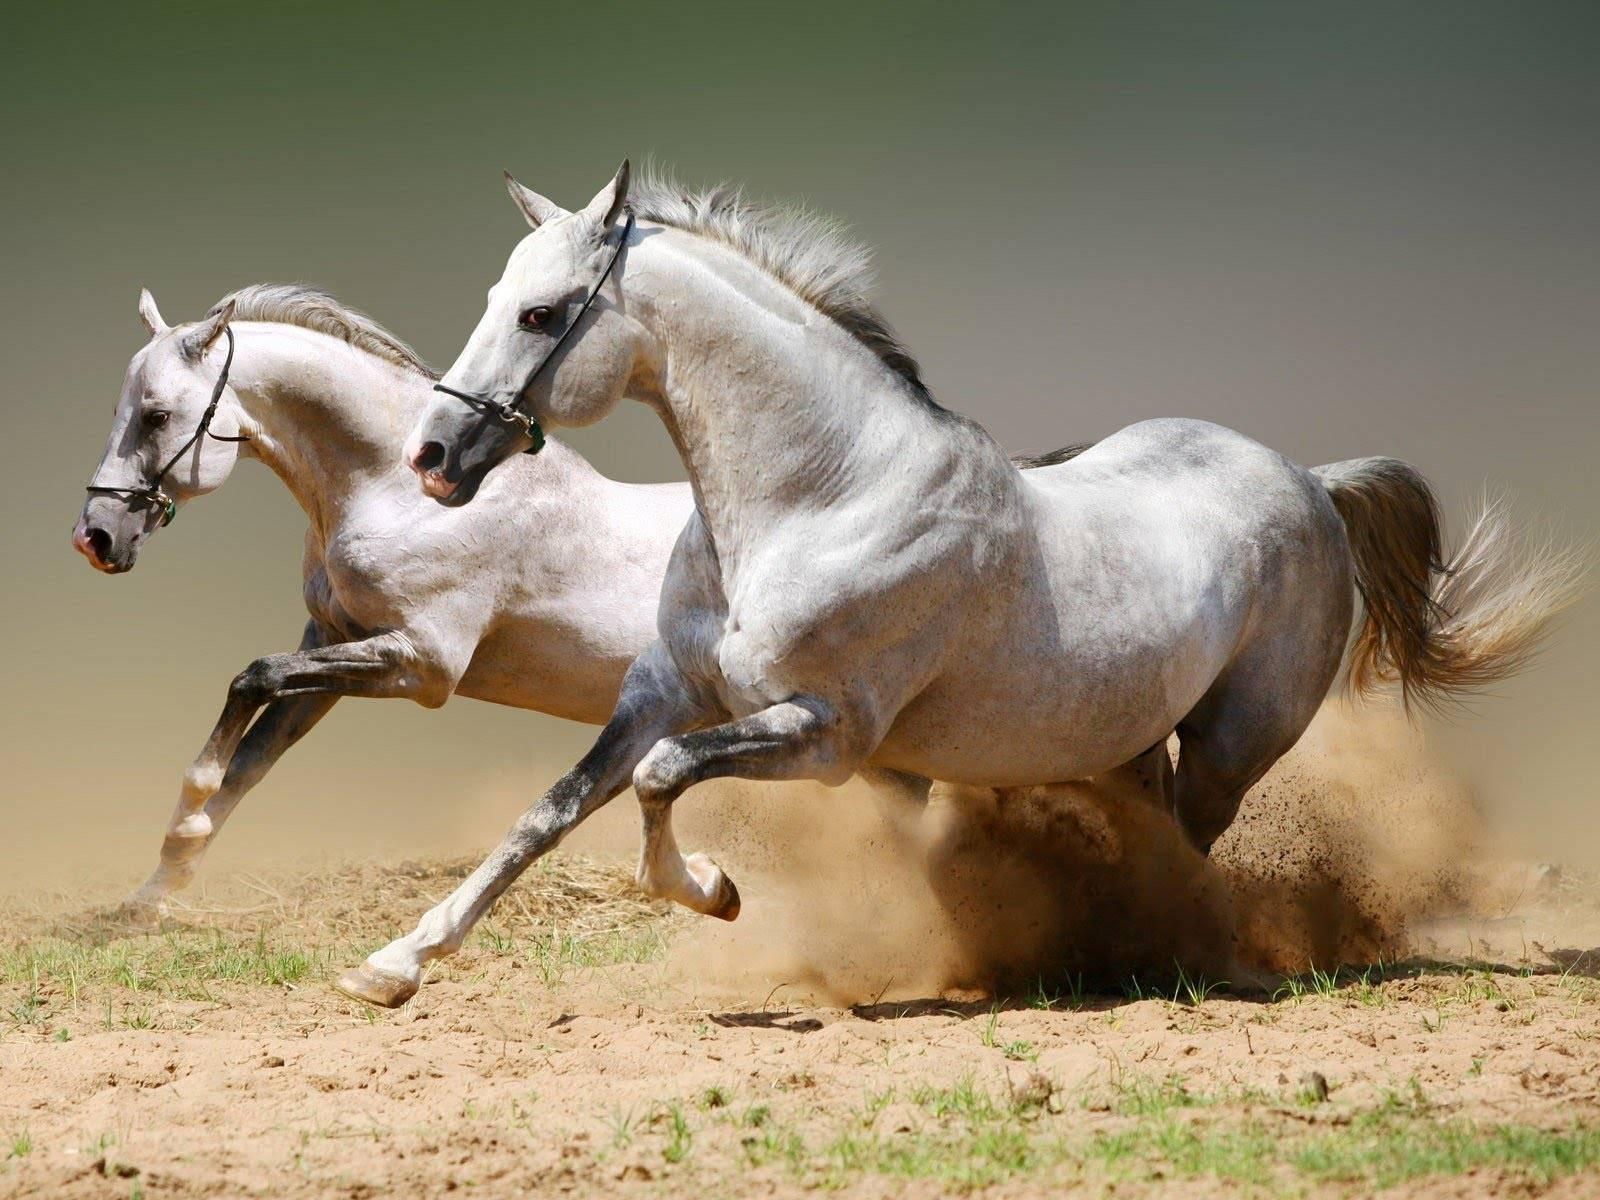 Интересно, сколько лет живут лошади?